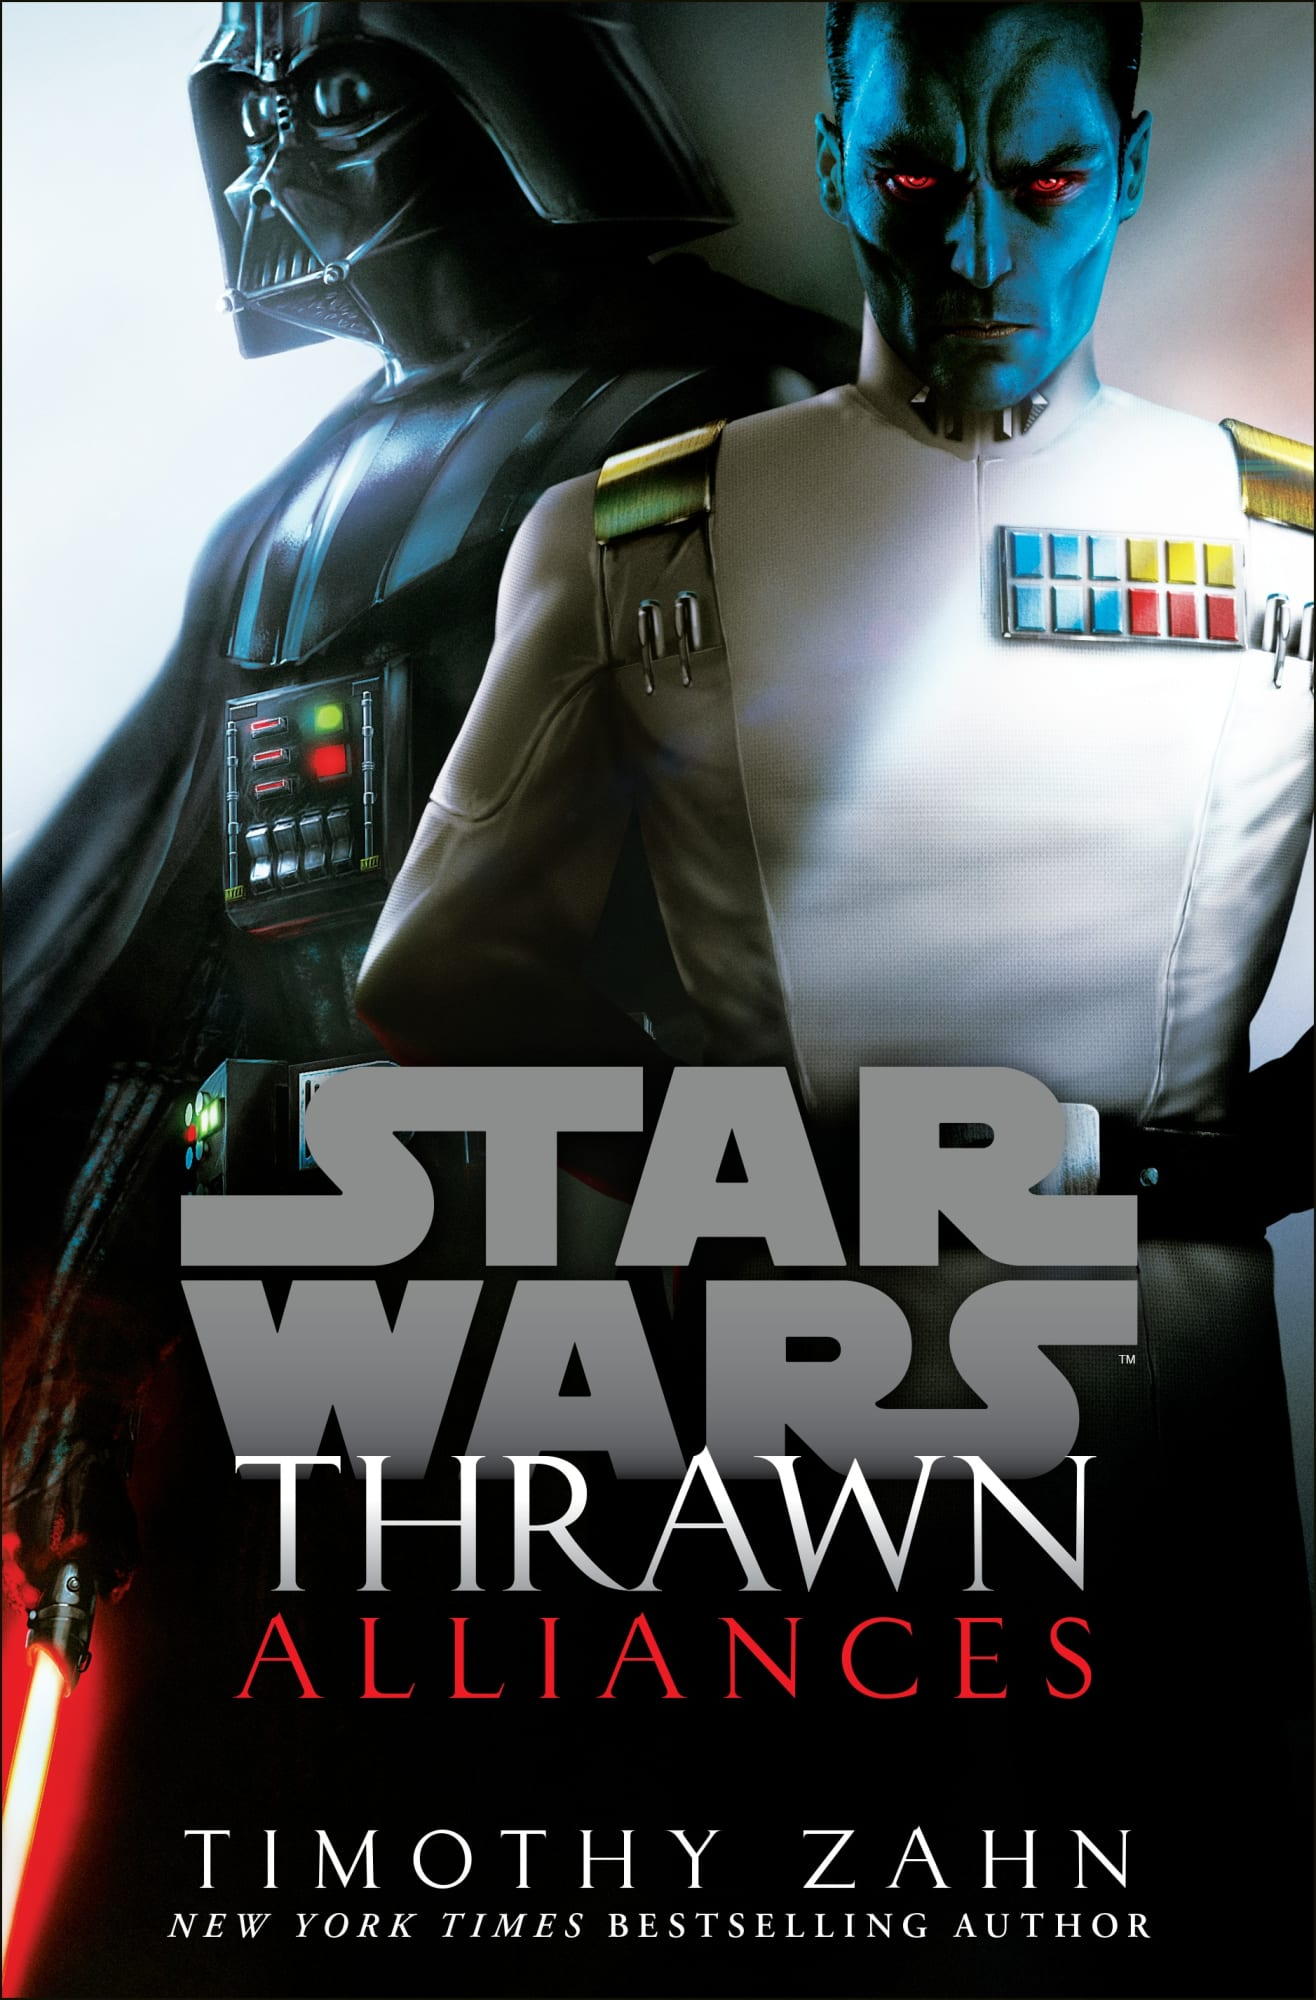 Star Wars: Thrawn Ascendancy gets a September release date